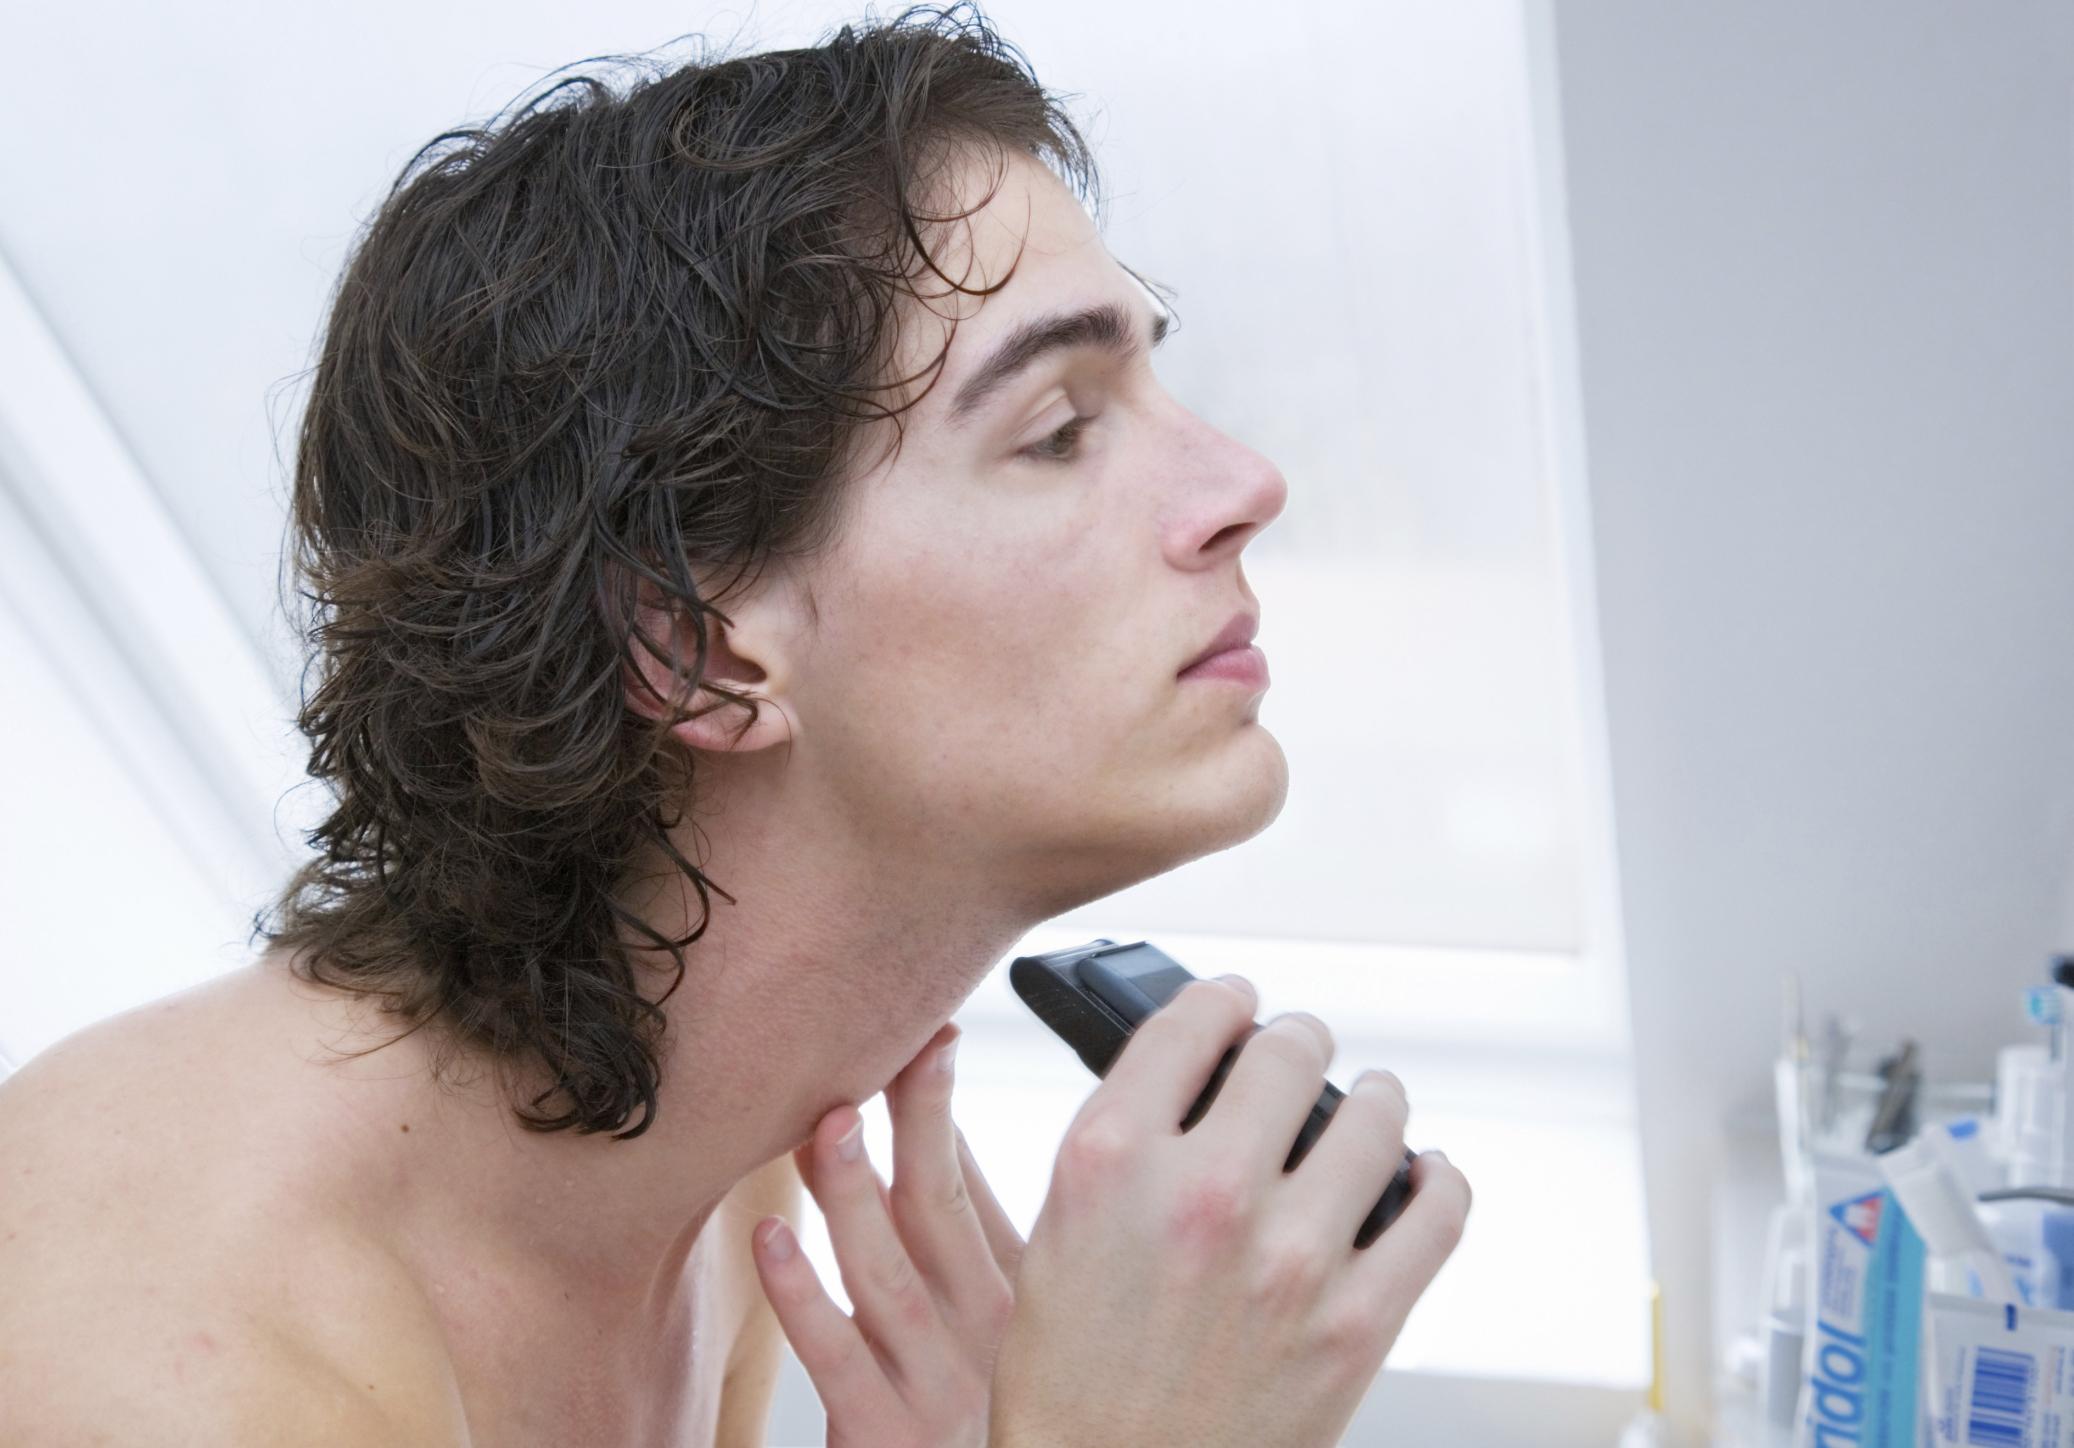 How to Get Rid of Ingrown Hair Scars | LEAFtv